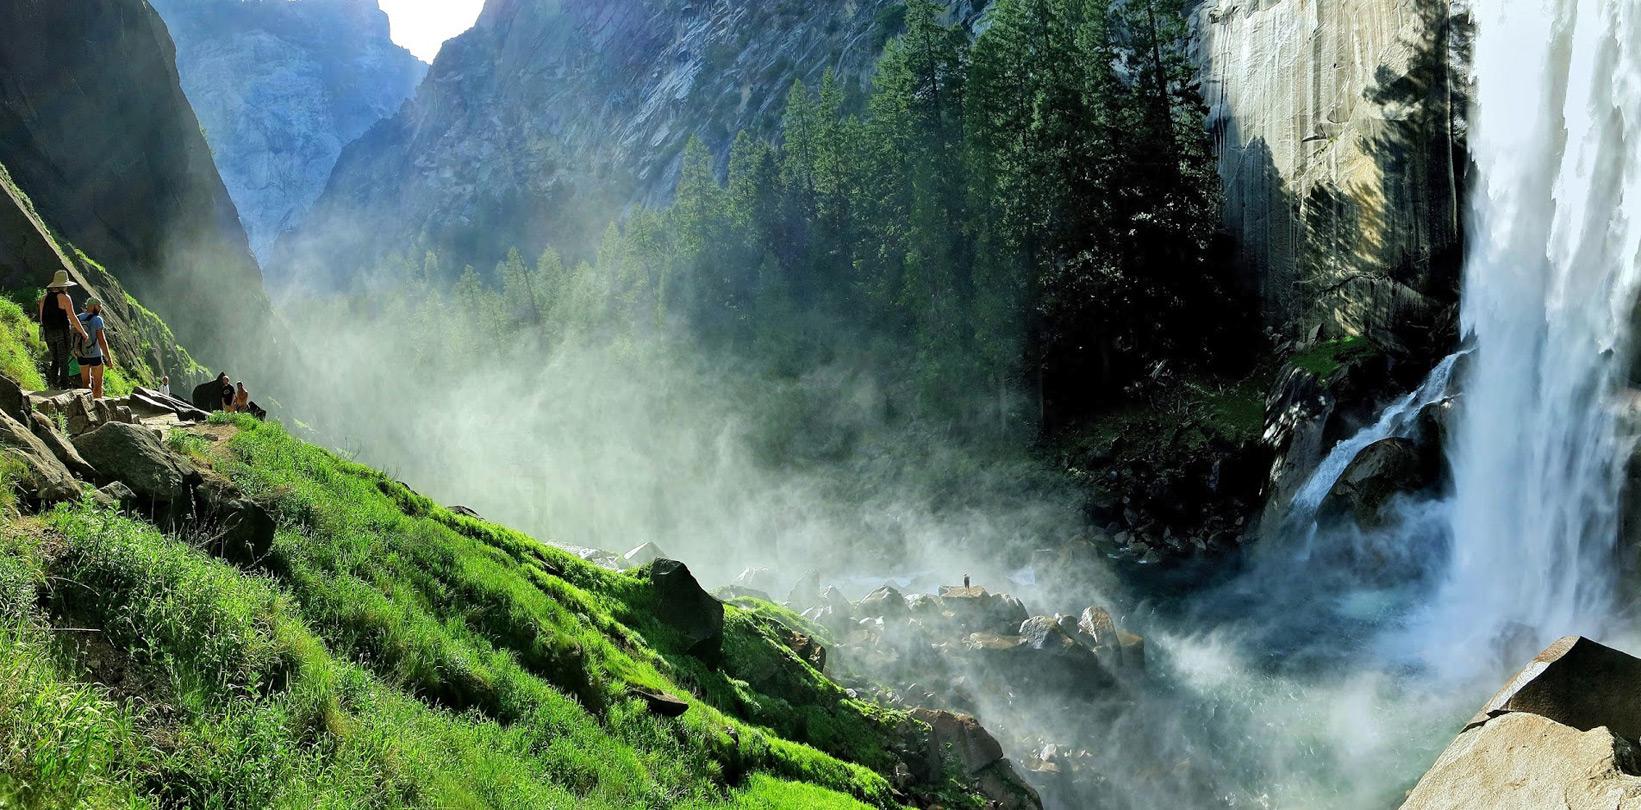 Vernal Fall, Yosemite National Park, California